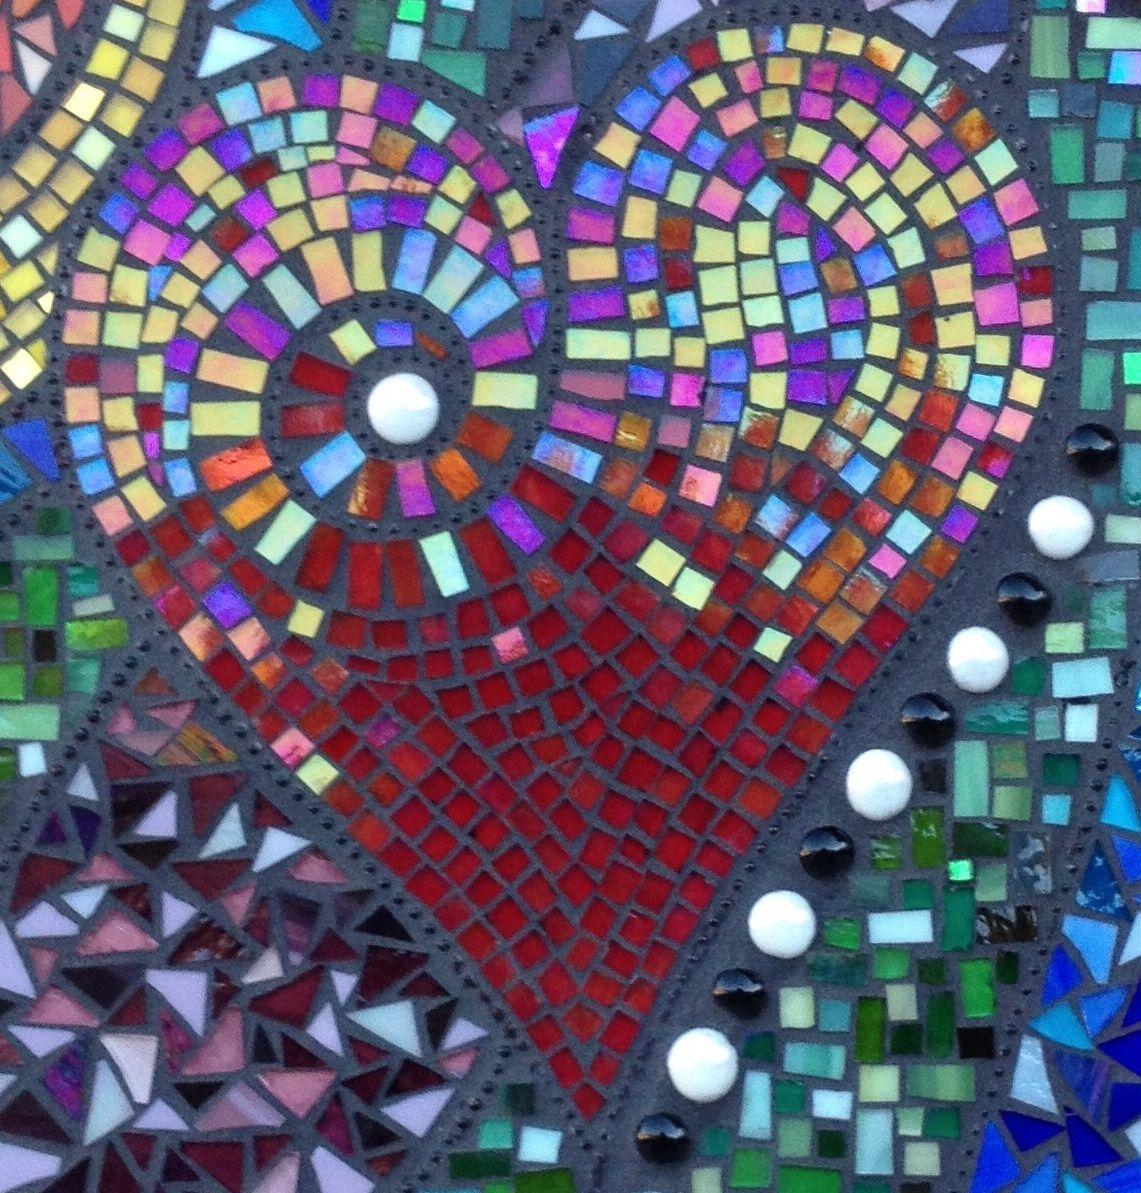 Free Online Mosaic Art Beginners Guide